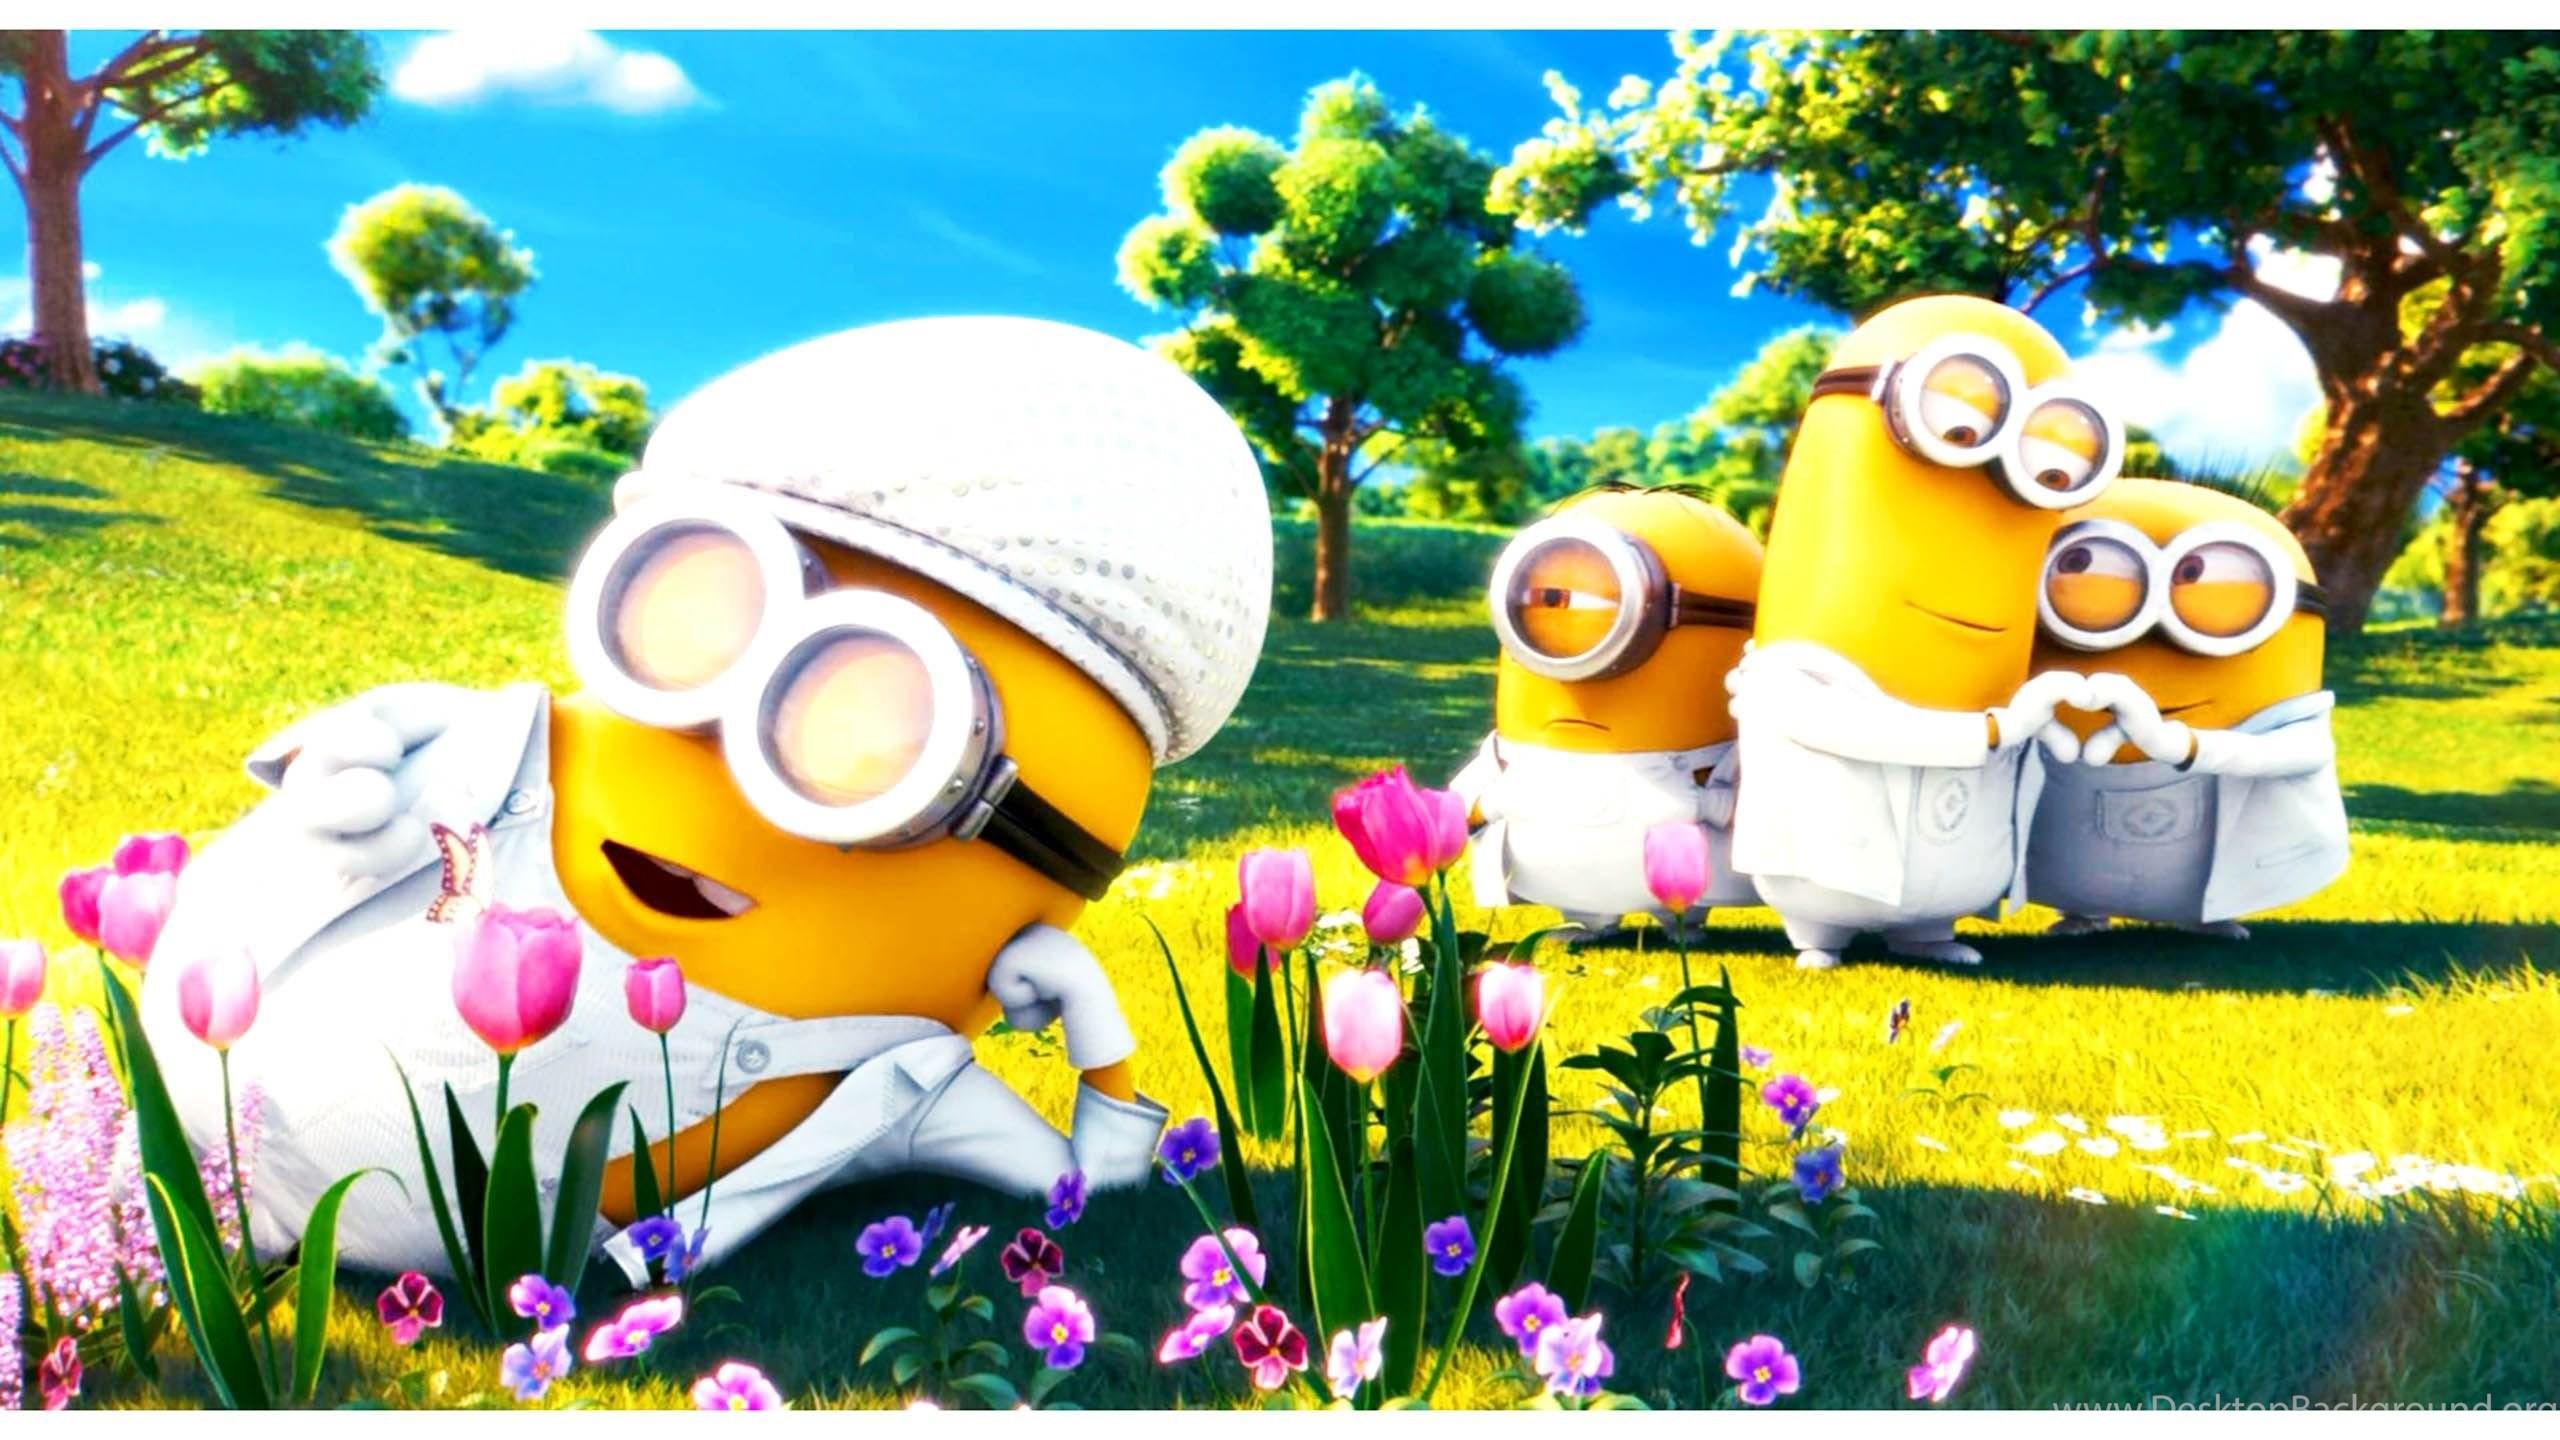 Minions Love Bananas 1080 Hd Wallpapers Desktop Background